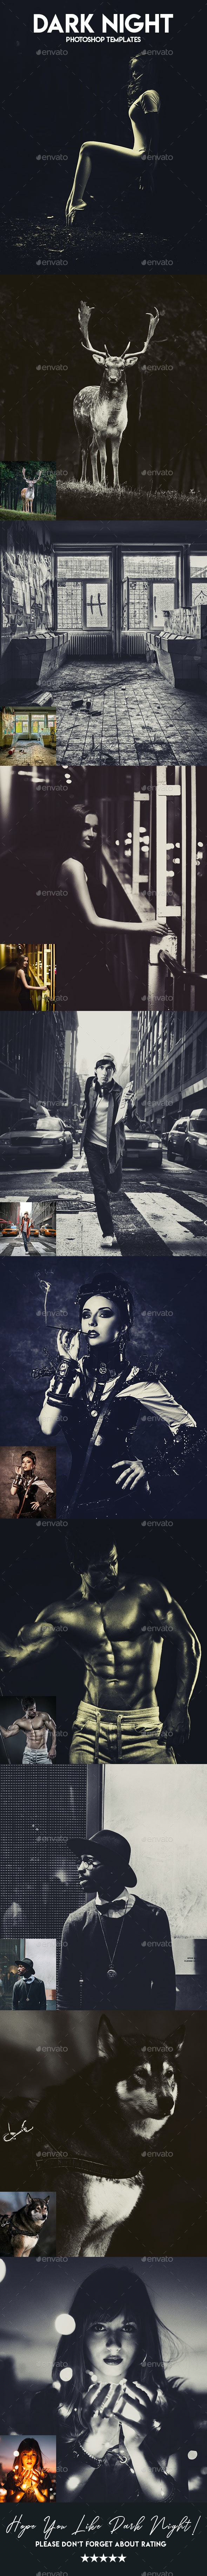 Dark Night Photoshop Templates - Urban Photo Templates